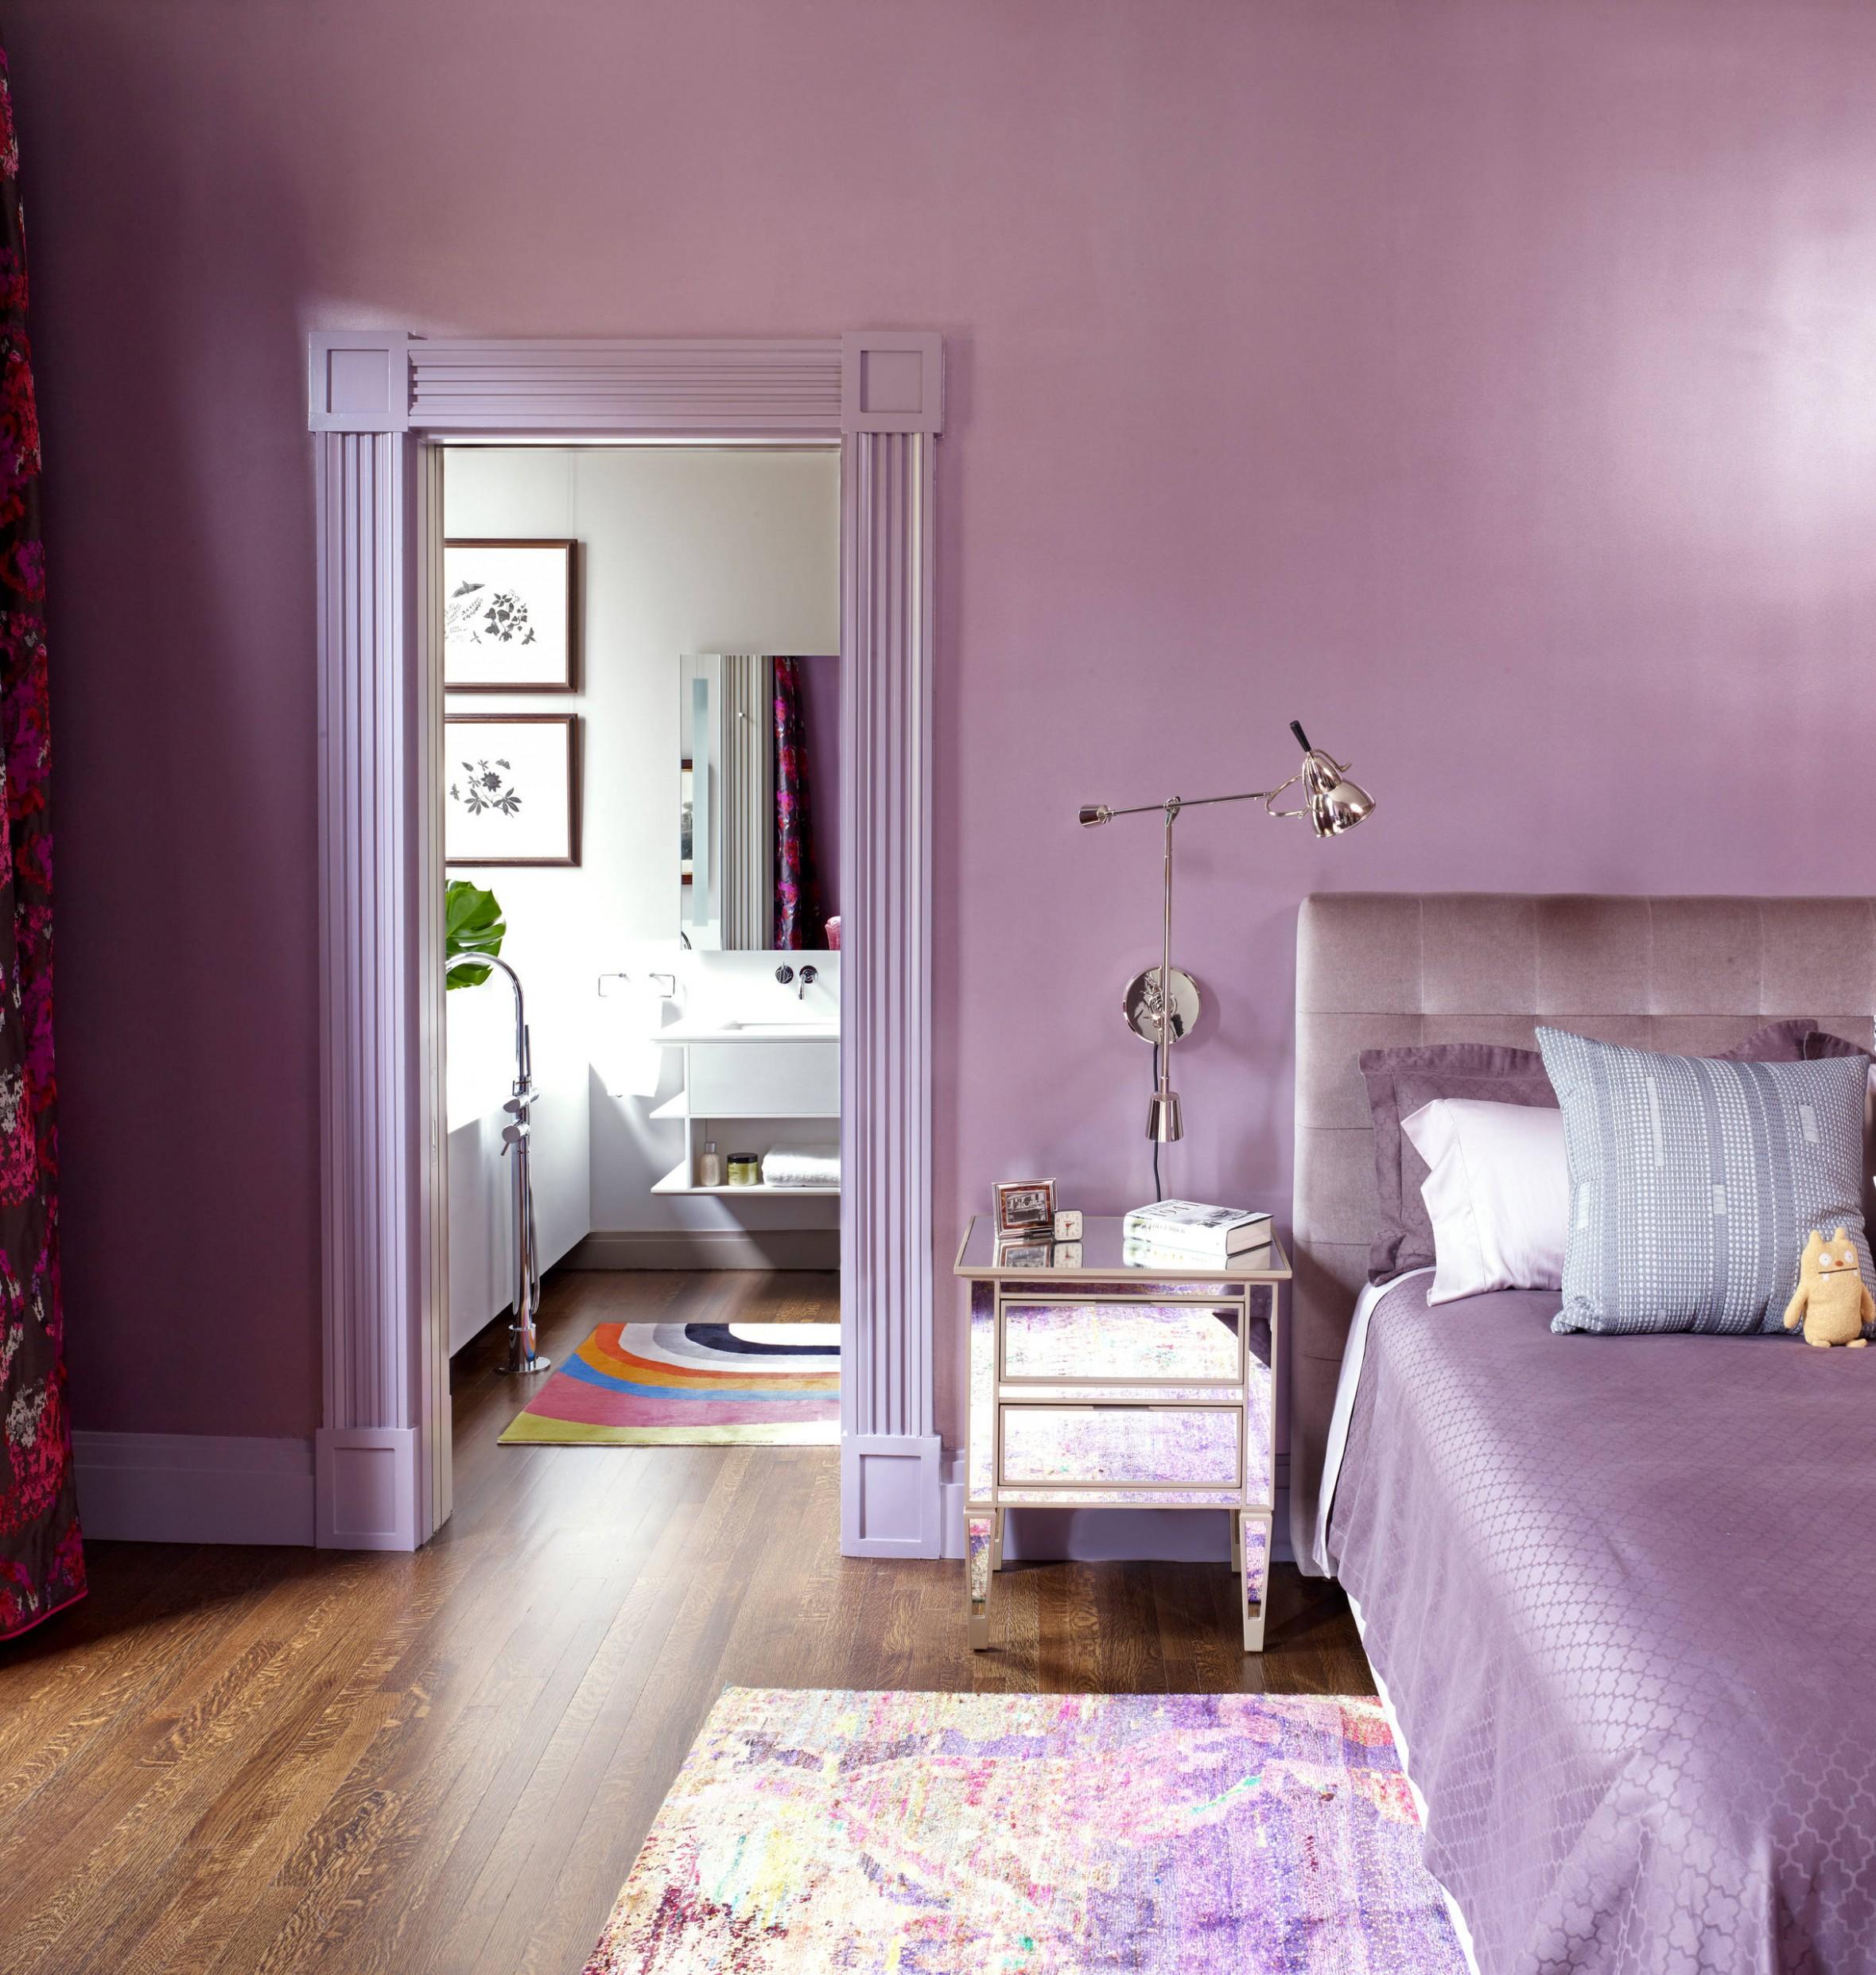 Lavender Bedroom Ideas And Photos  Houzz - Bedroom Ideas Lavender